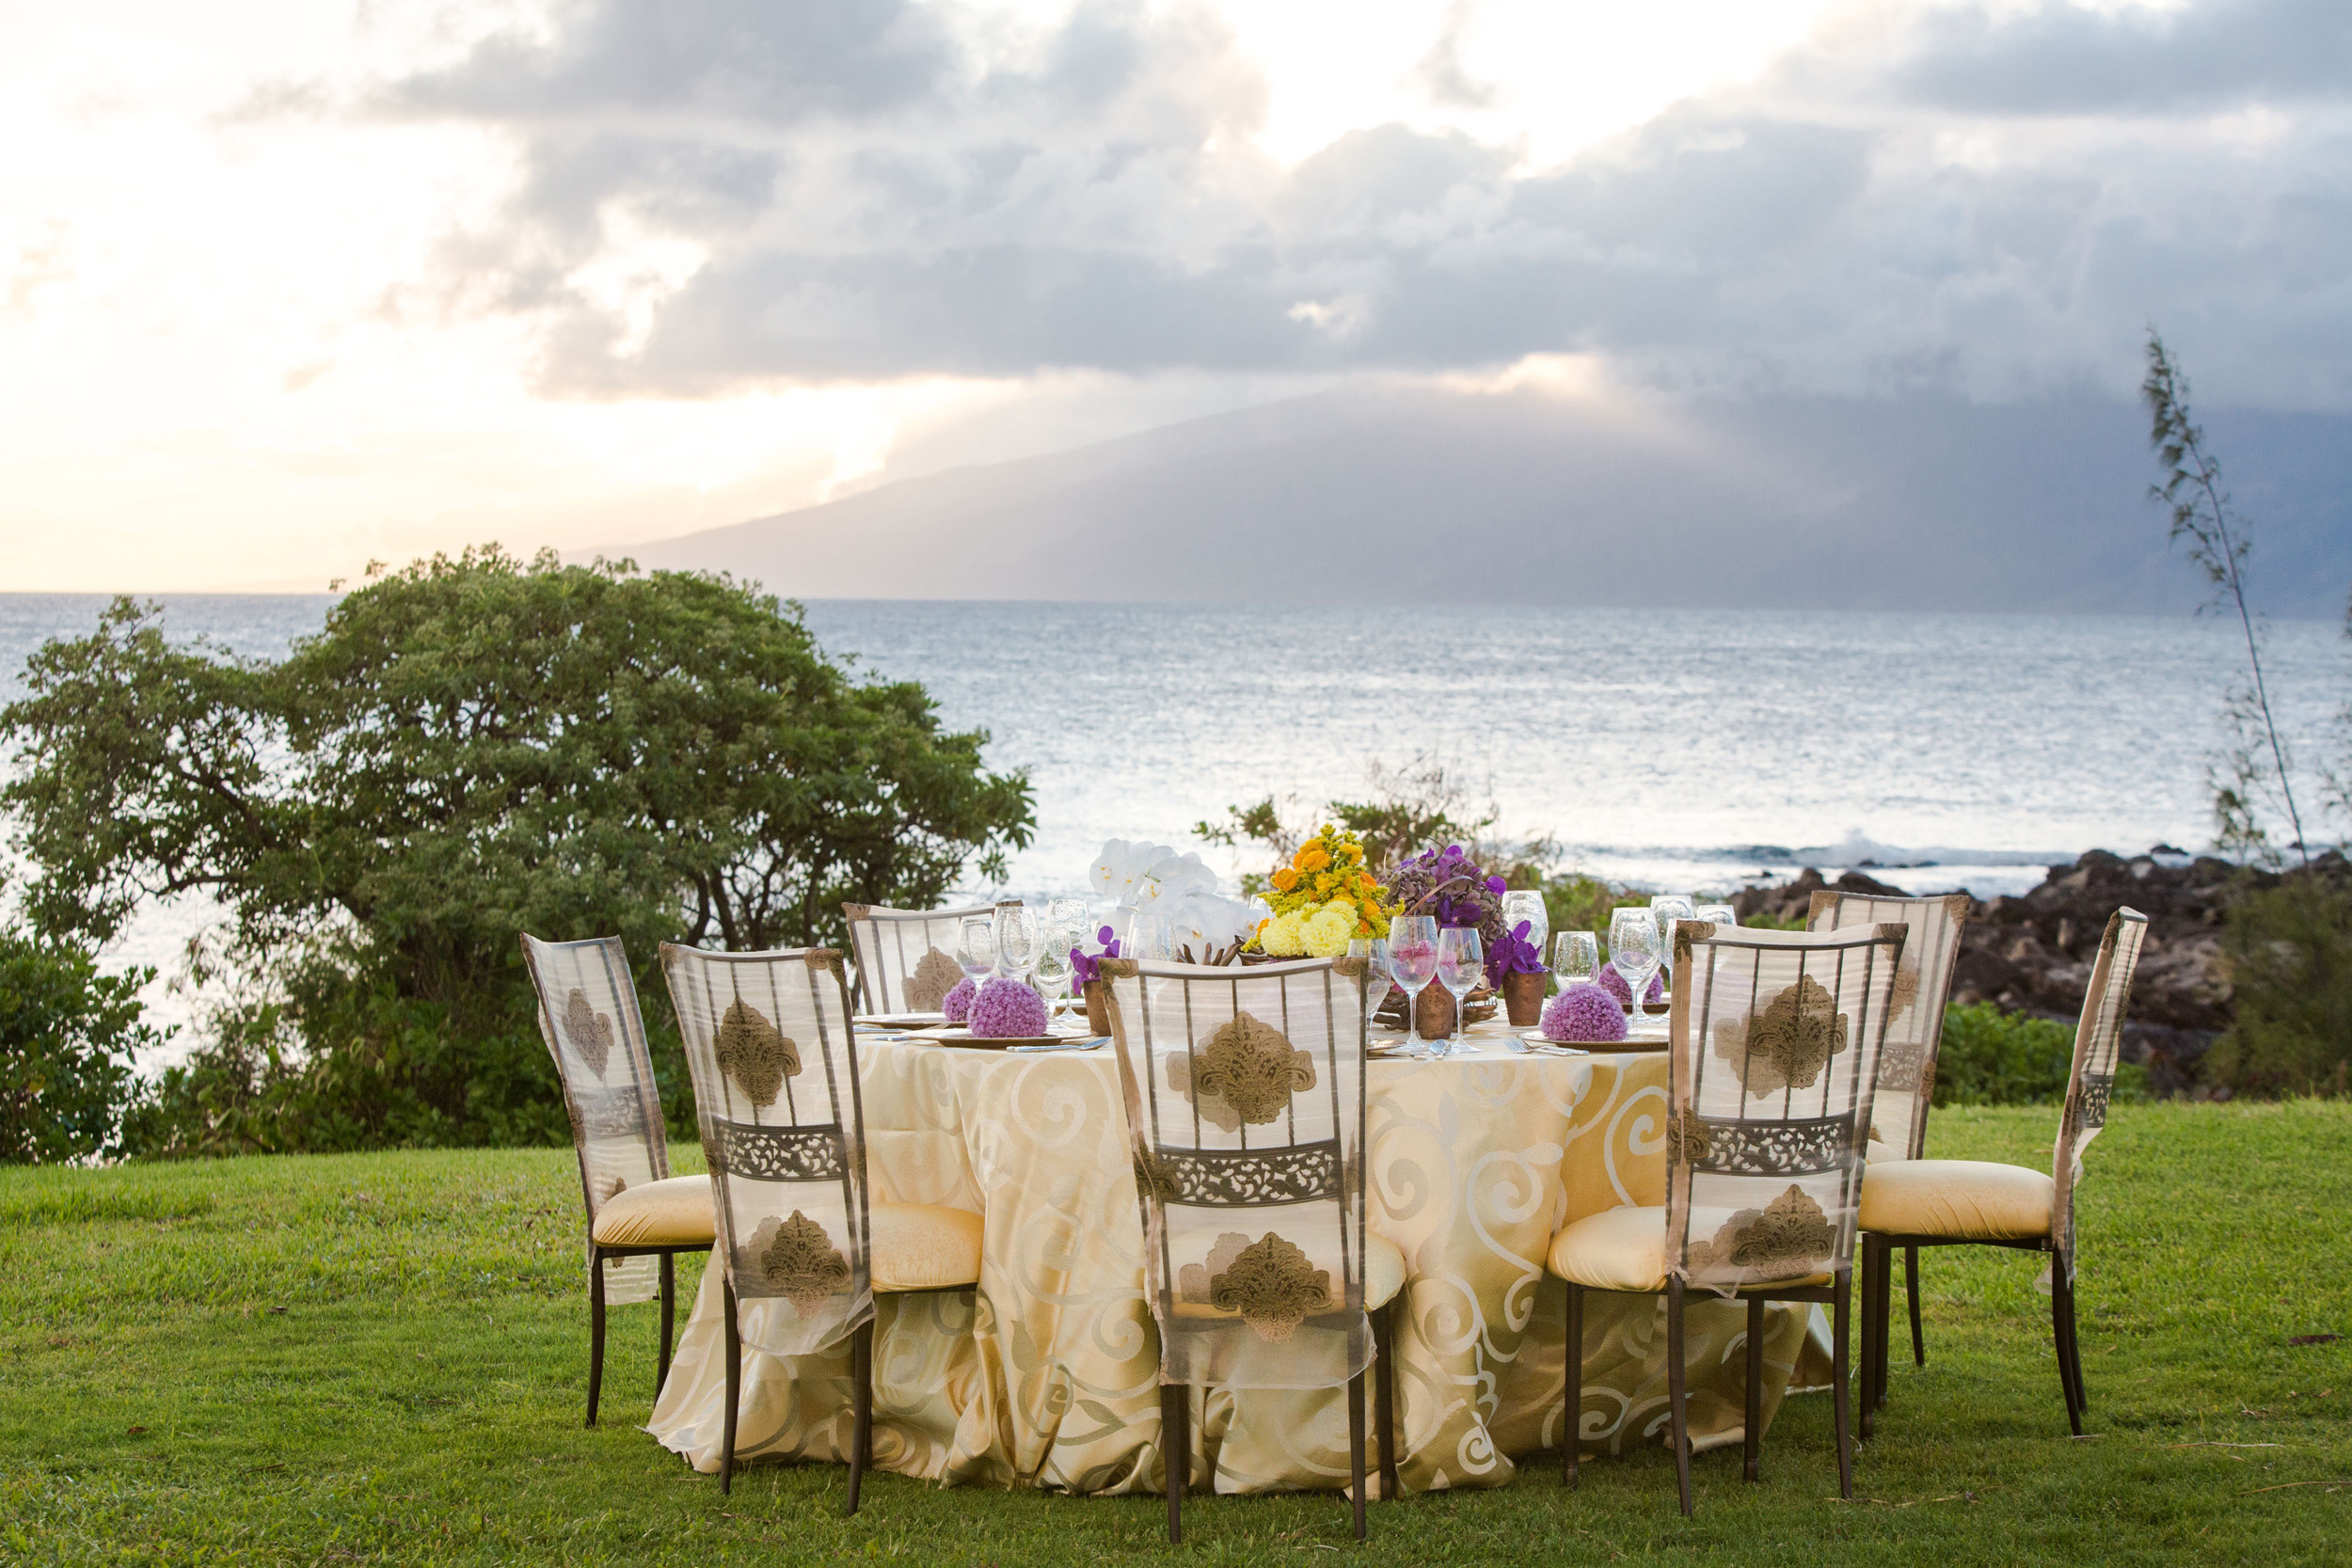 IEH-Table-Desings-at-the-Montage-Kapalua-1001.jpg